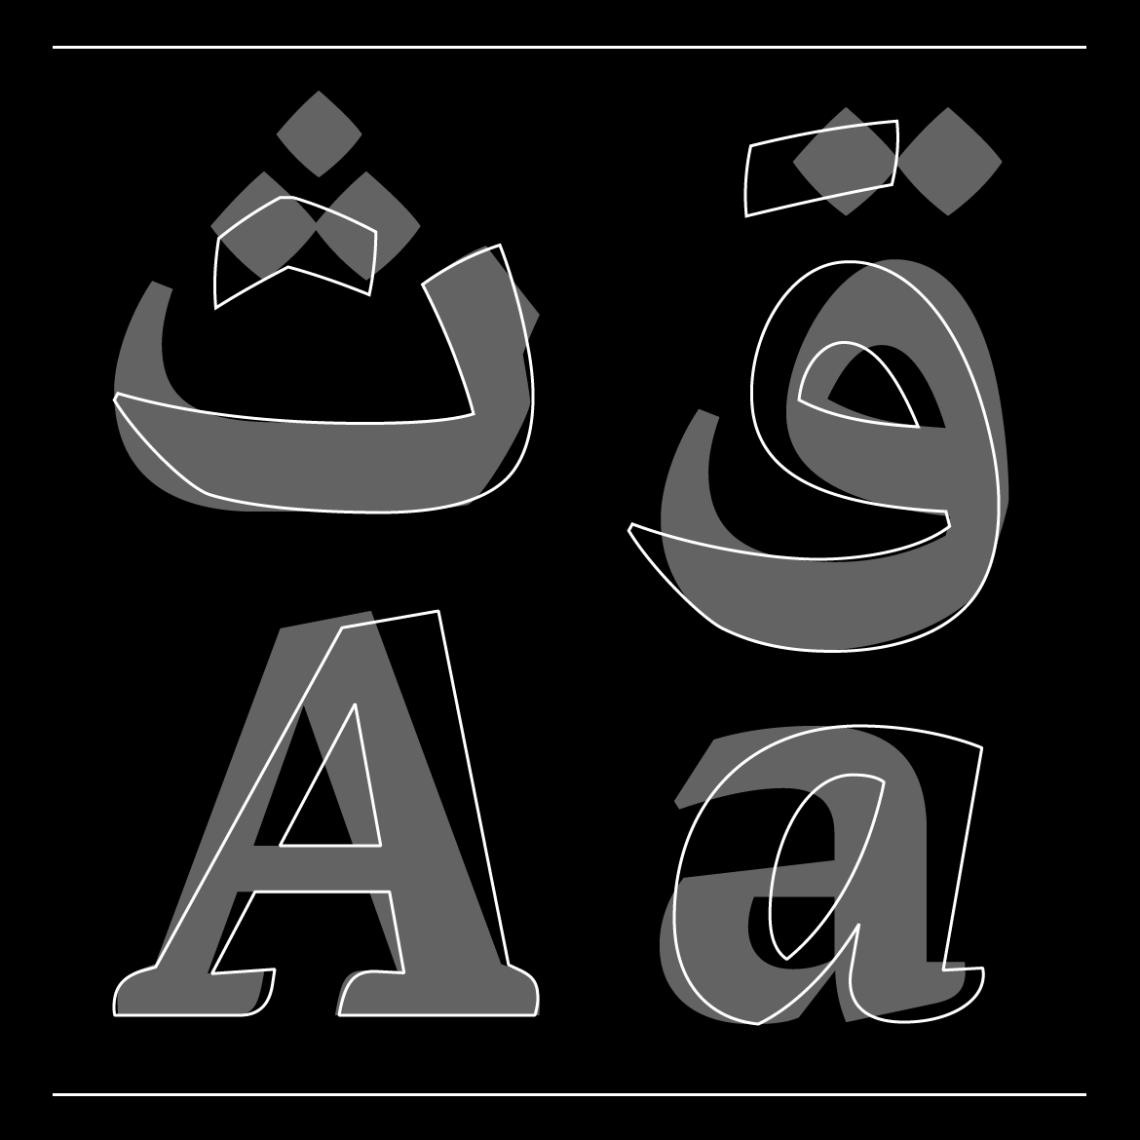 29LT-Zarid-Text-Image-08